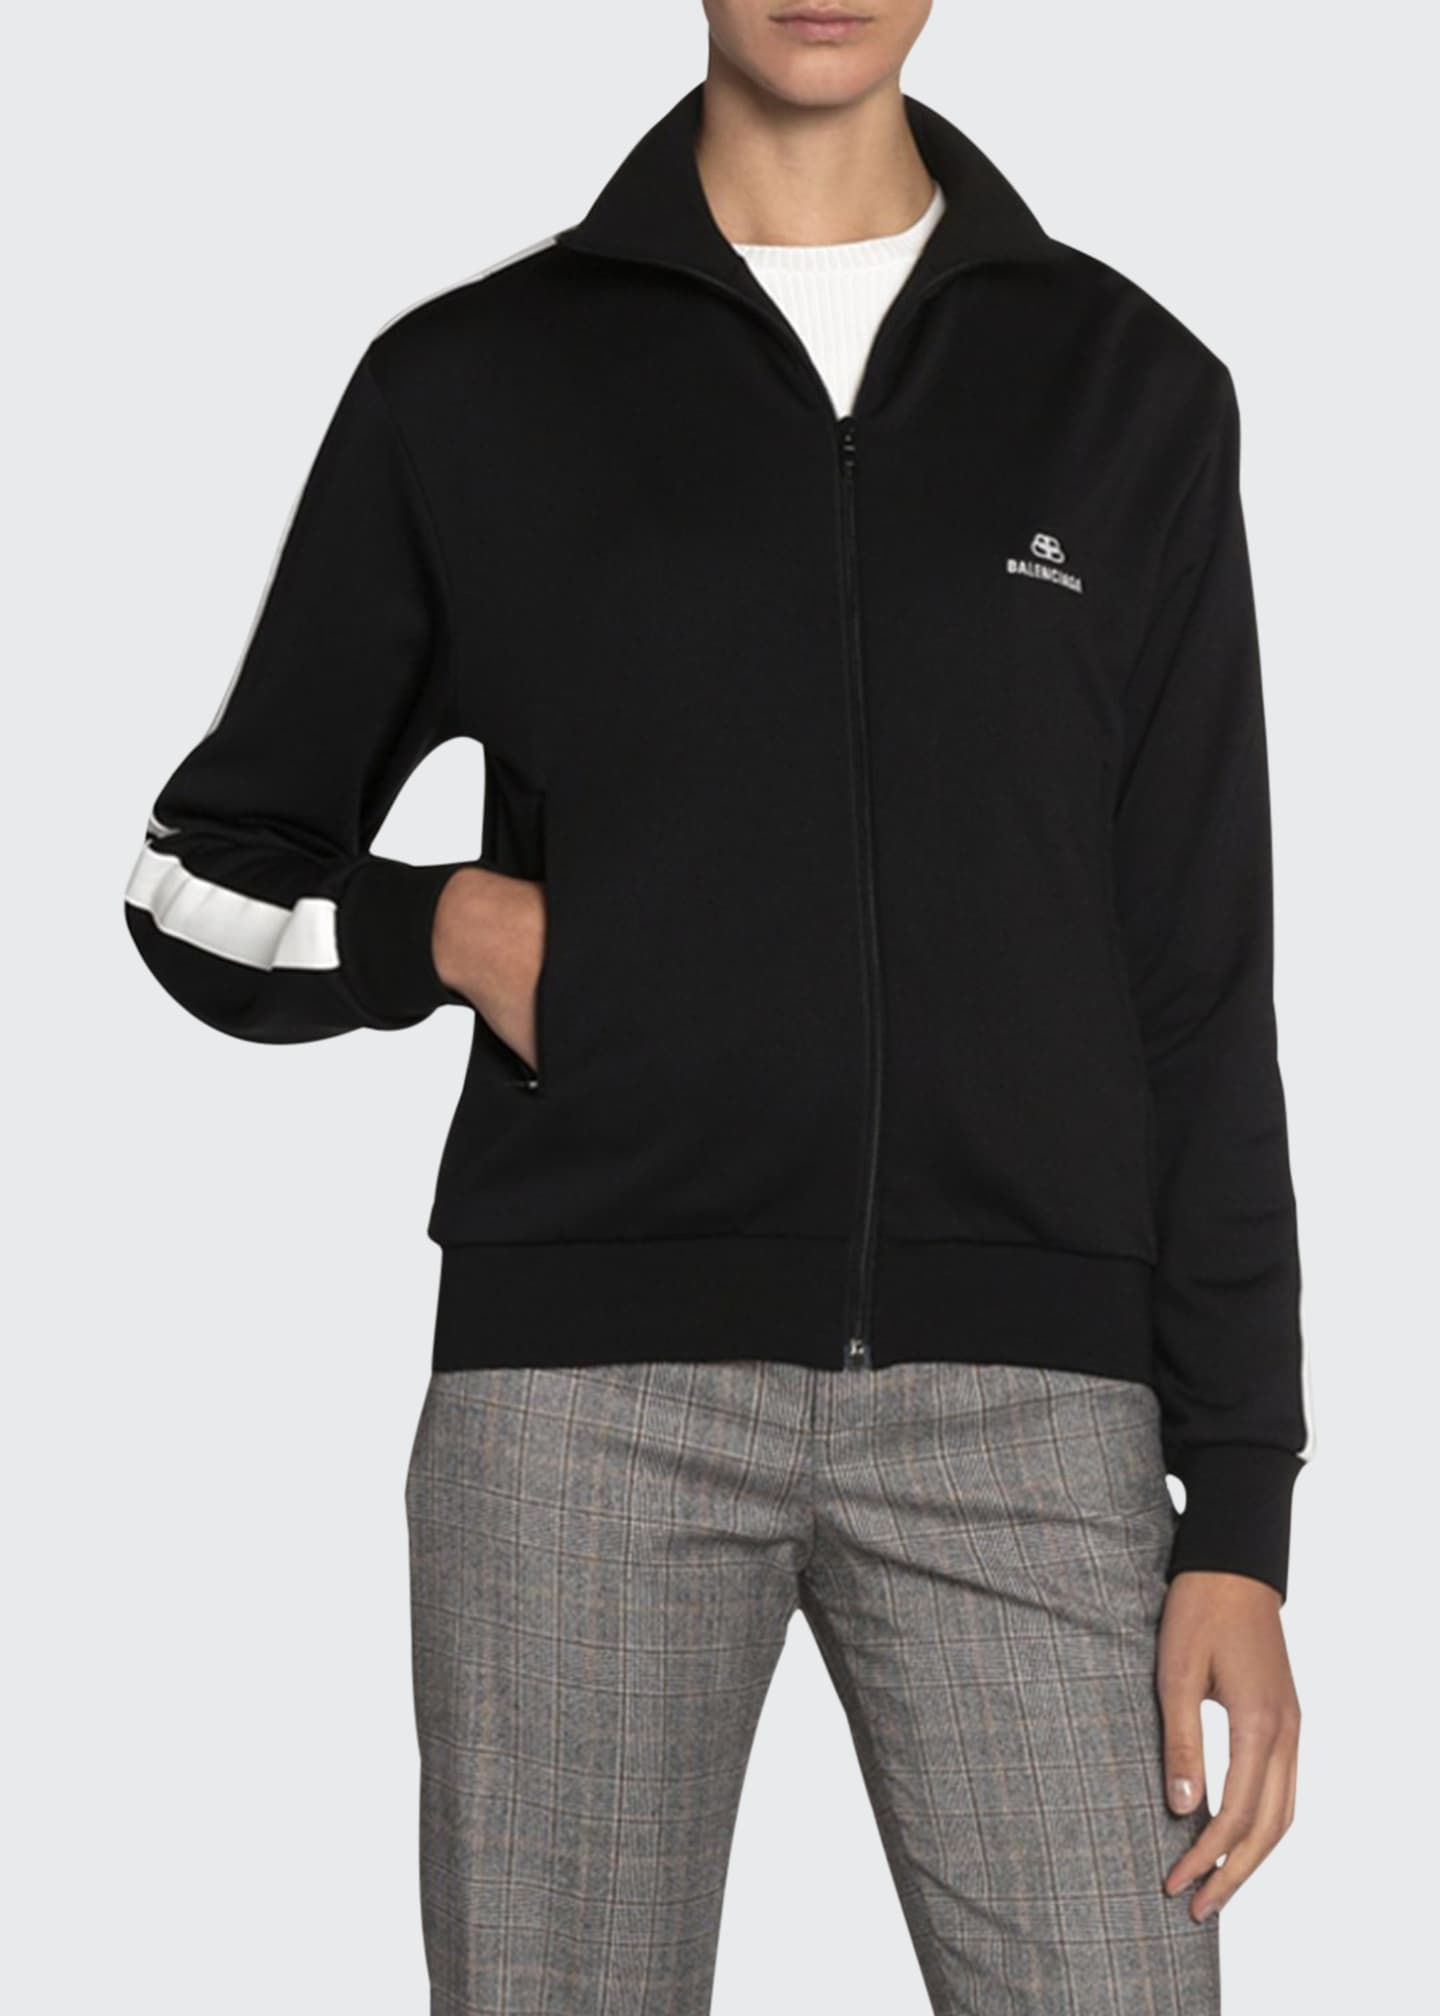 Balenciaga Jersey High-Neck Track Jacket